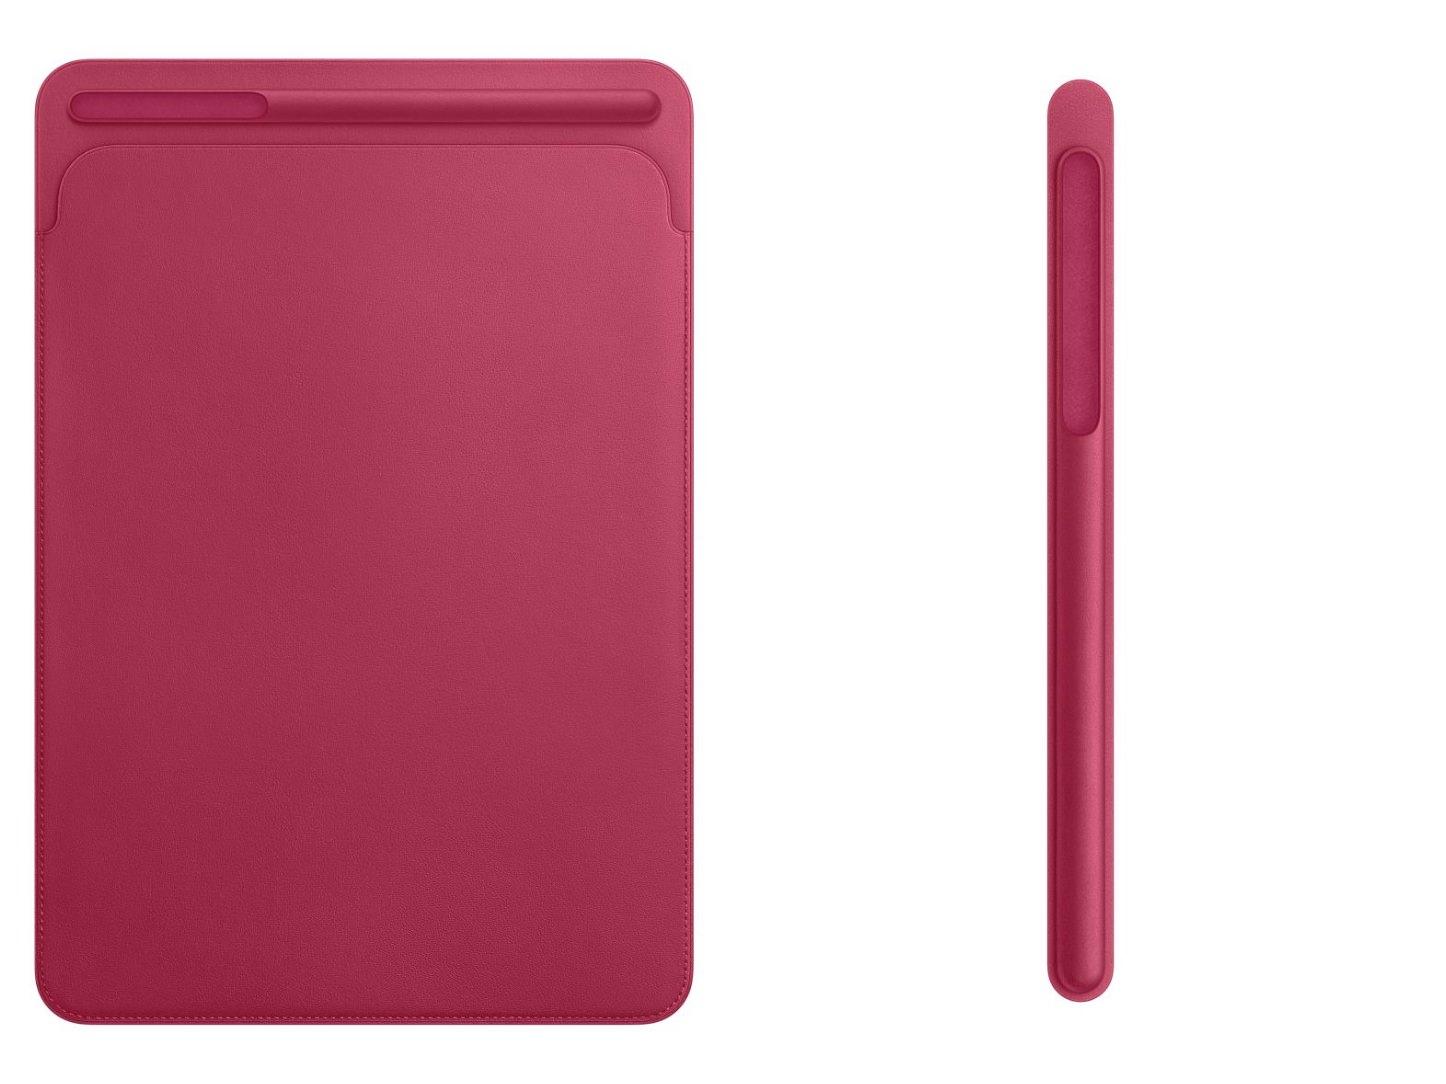 New-iPad-Pro-Color.jpg